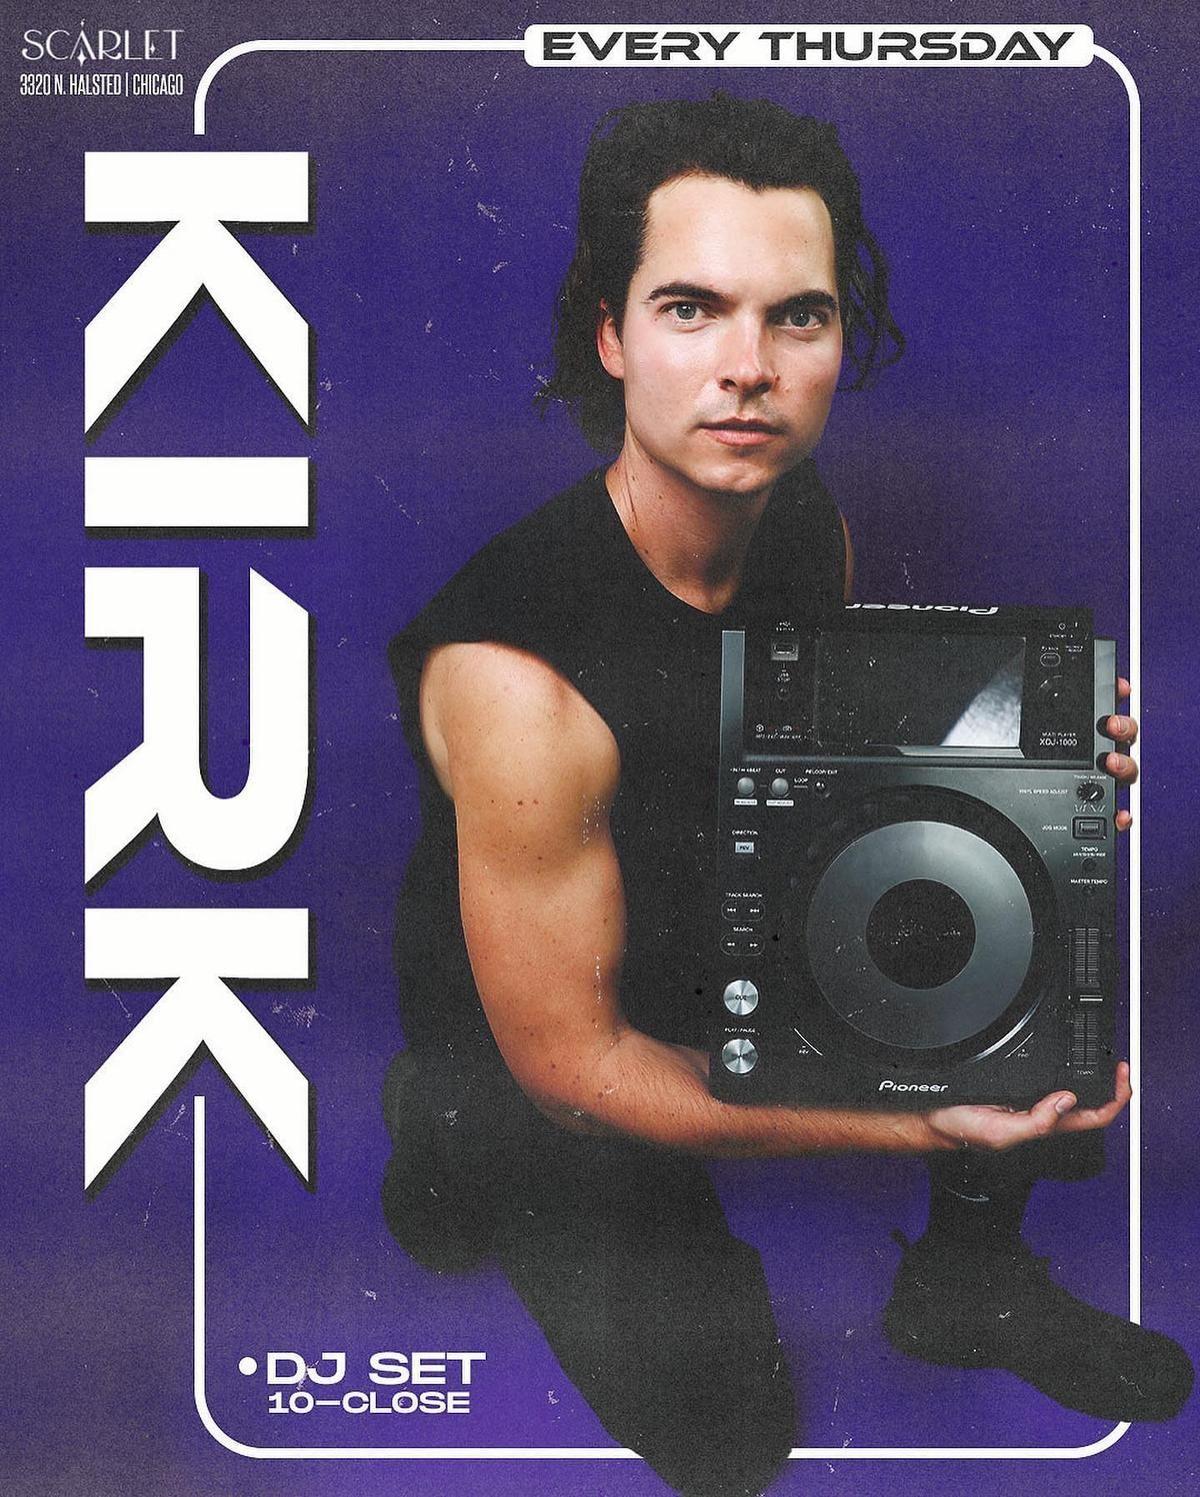 Frat Night with DJ Kirk